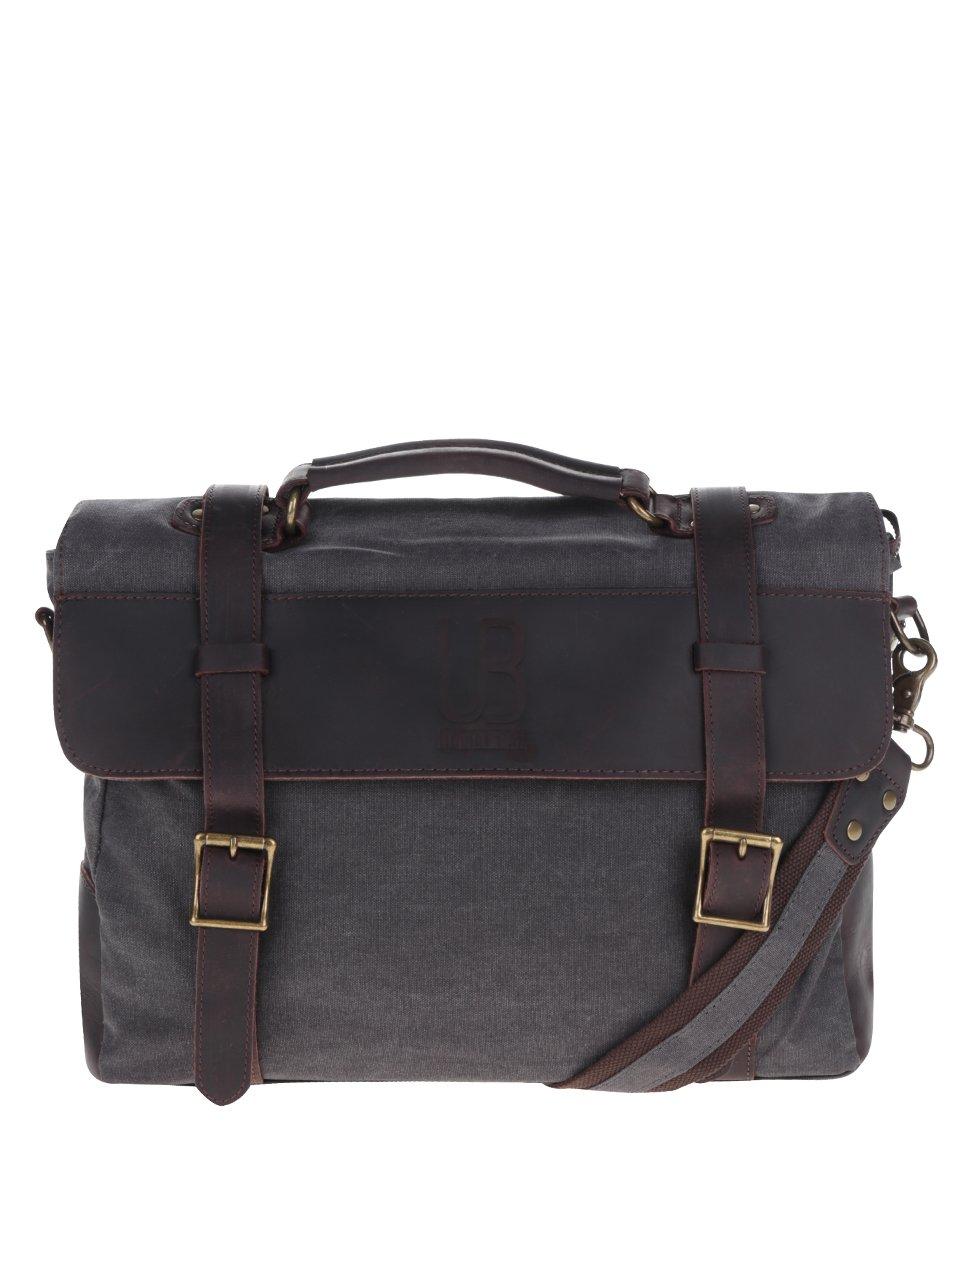 Tmavě šedá unisex taška Urban Bag